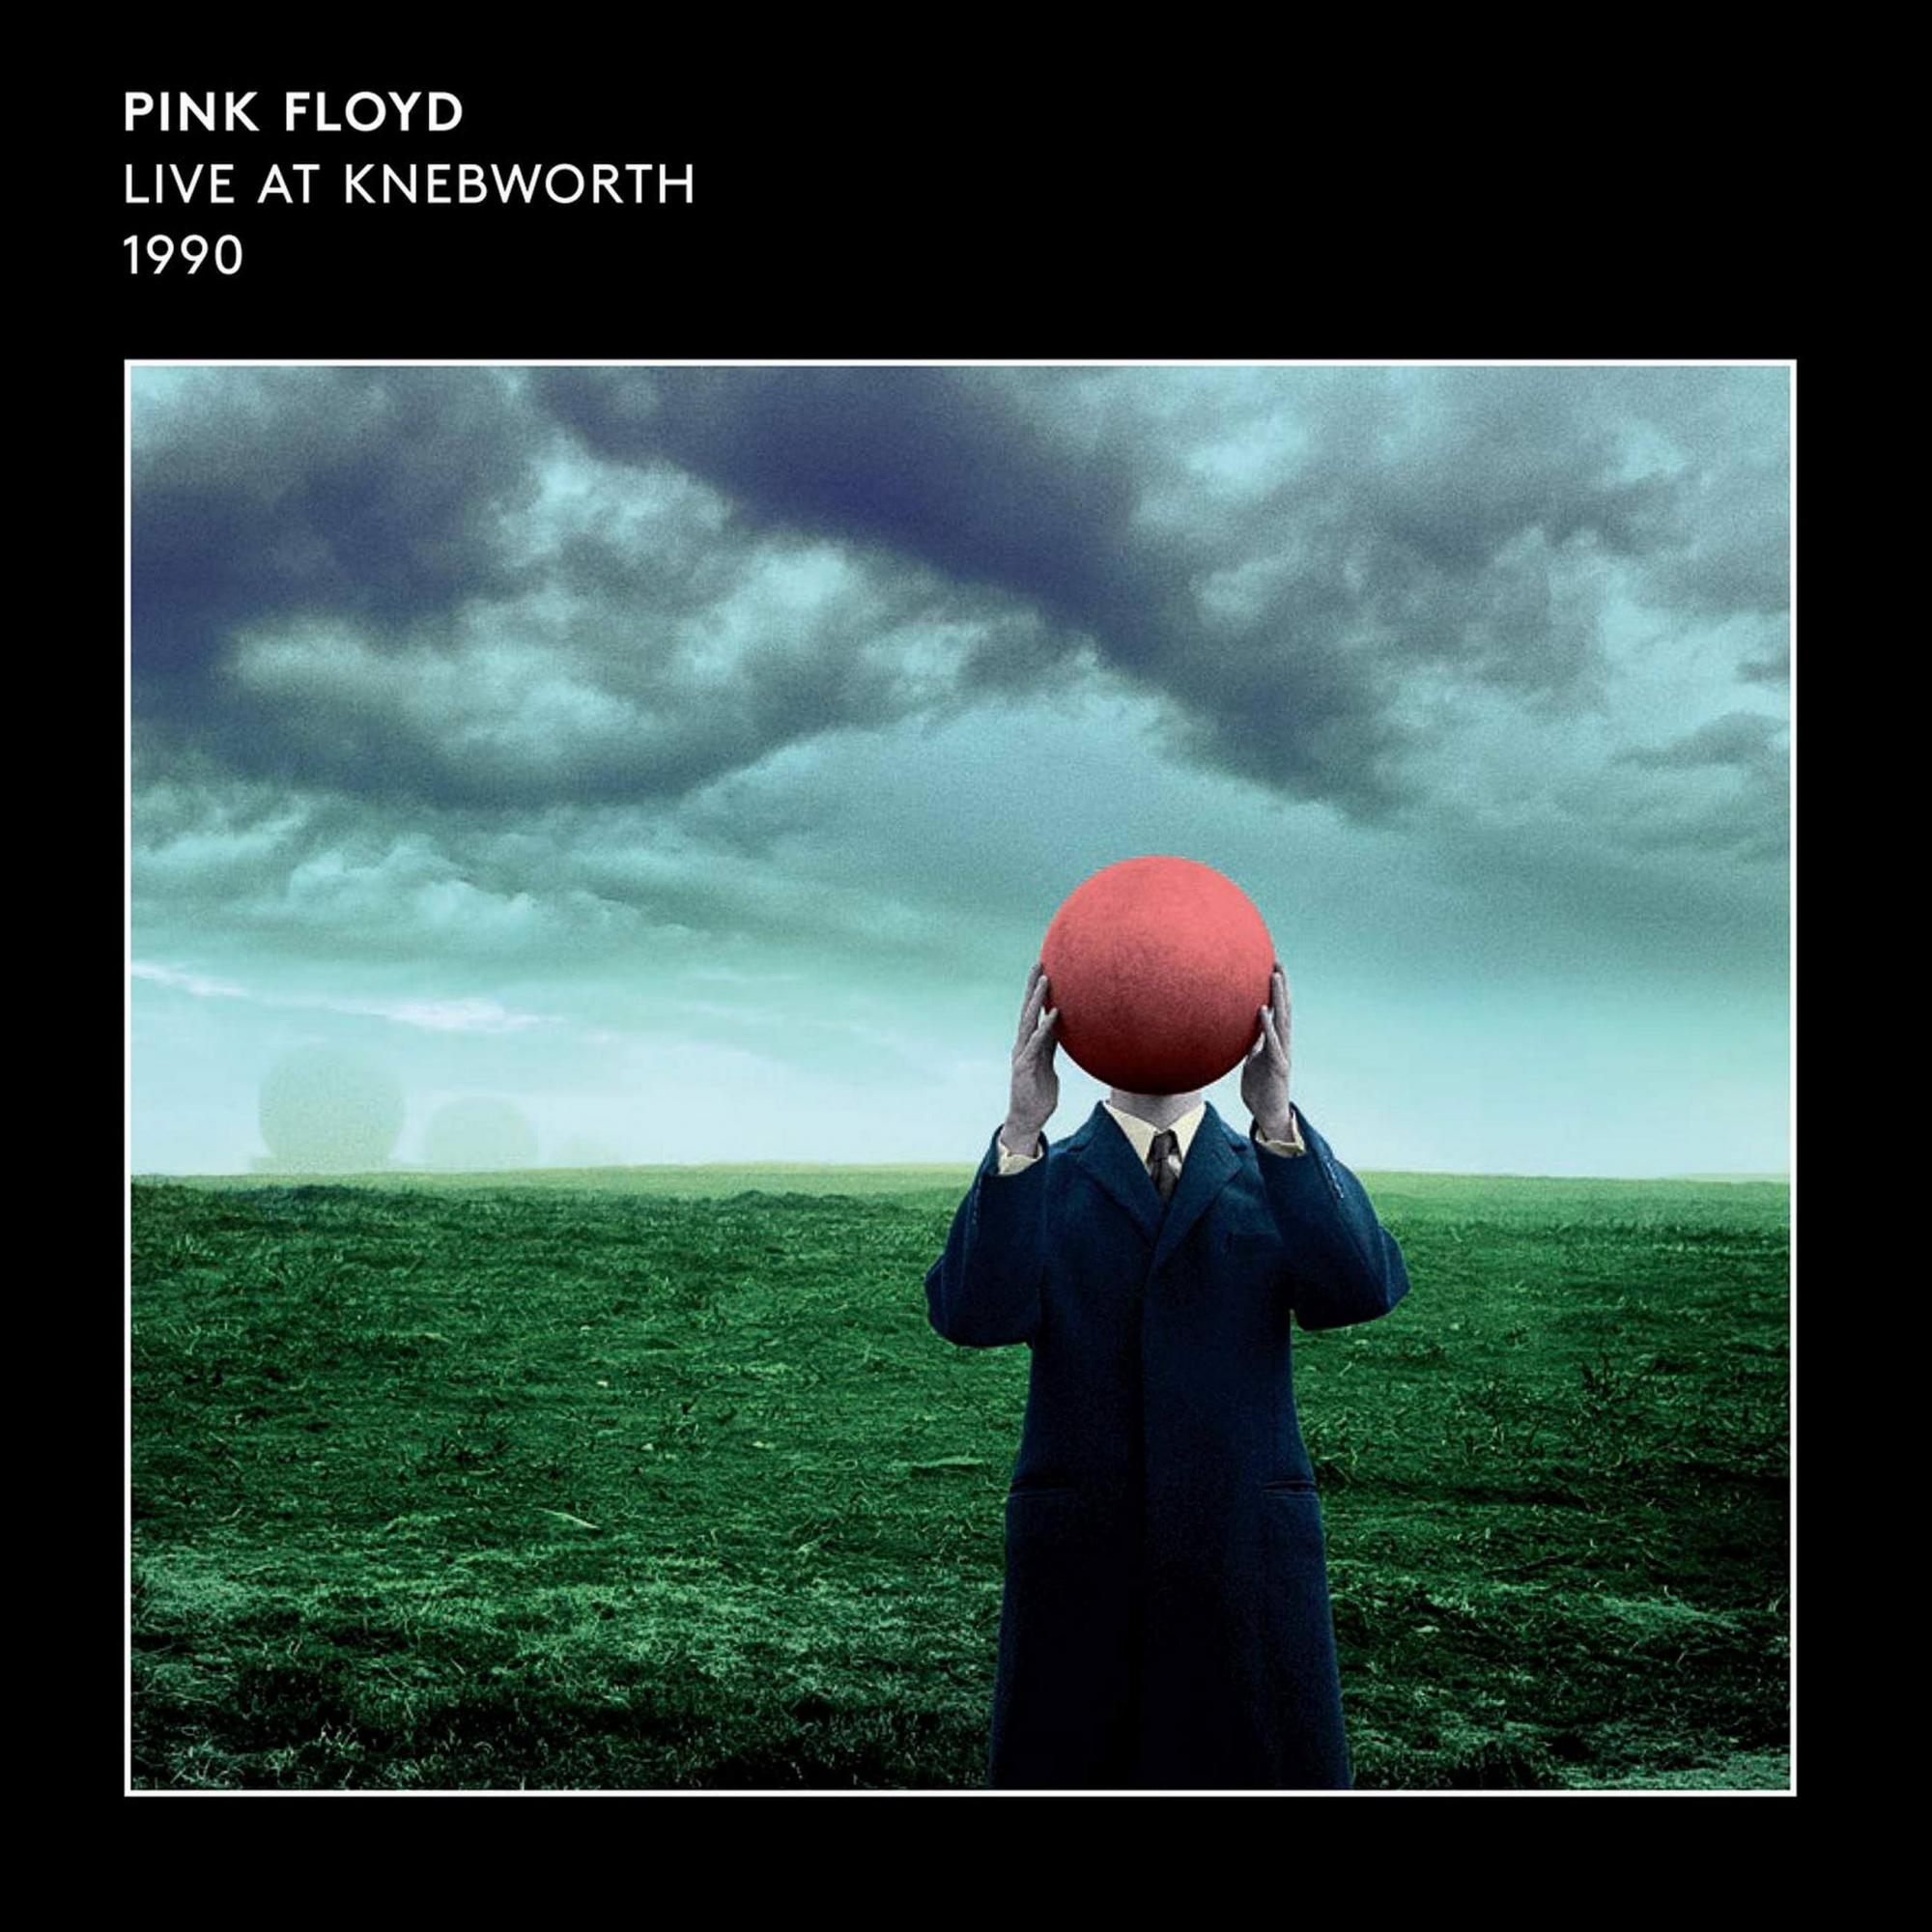 pink-floyd-live-at-knebworth-1990-cover_big.jpg